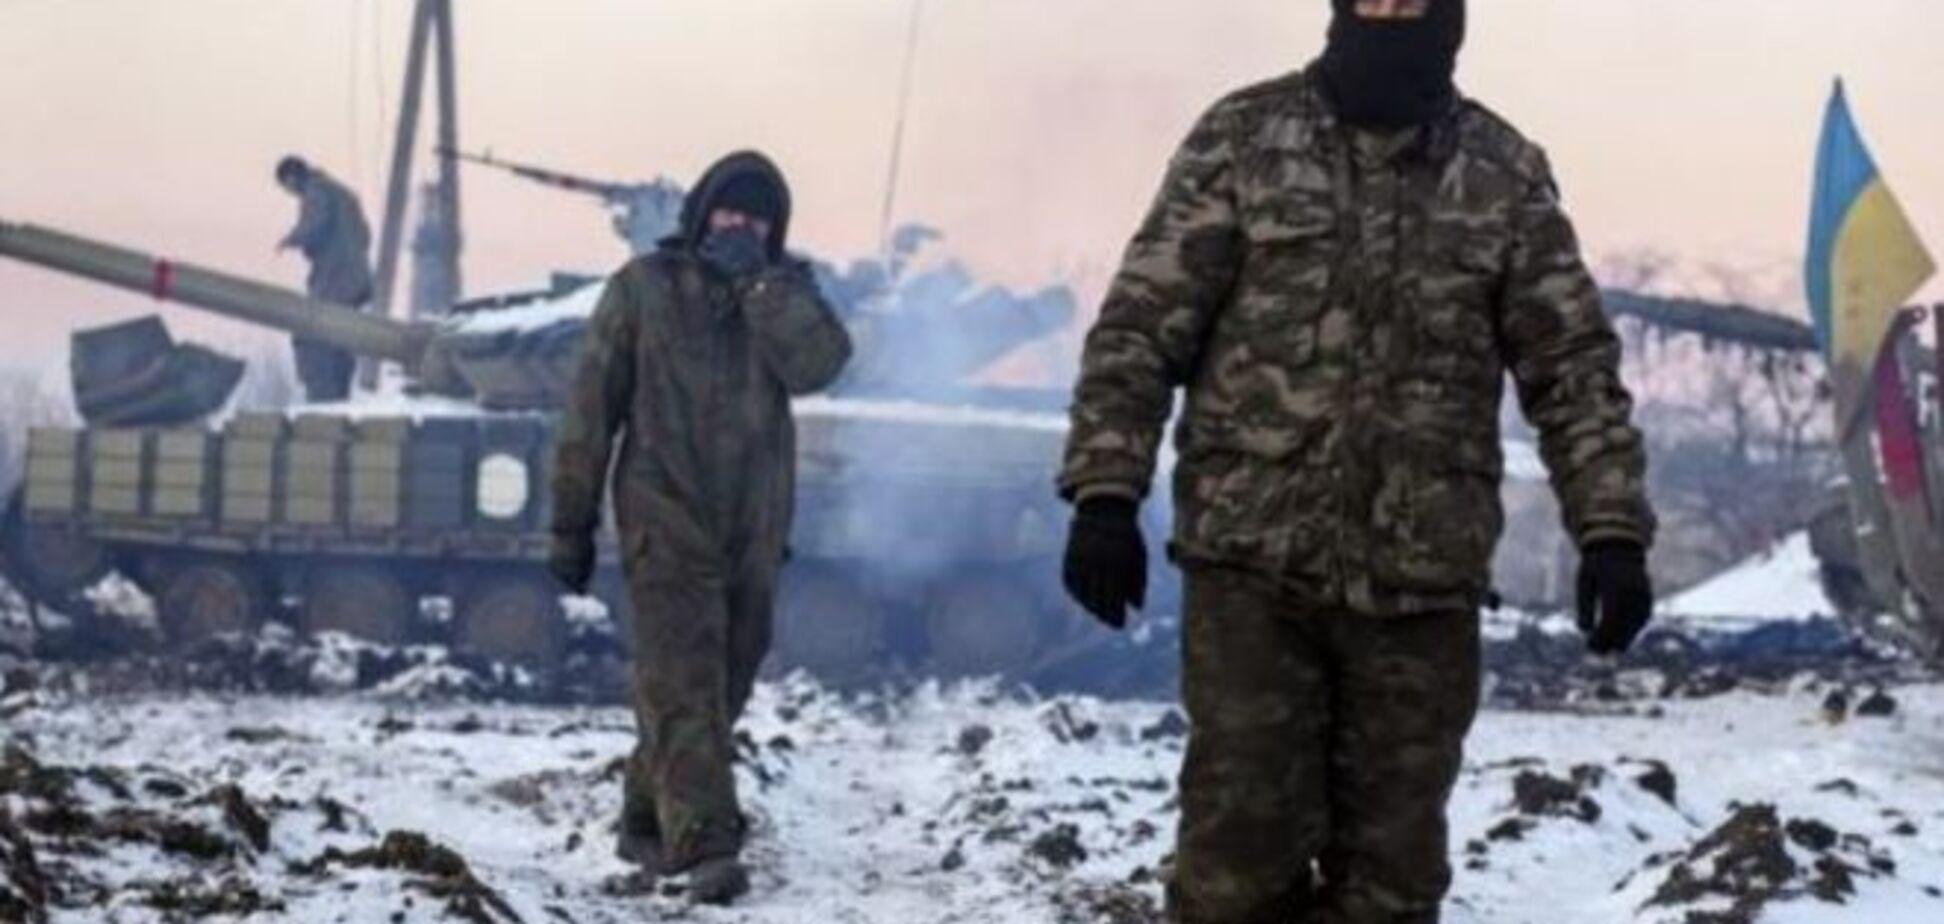 Силы АТО на Луганщине завершили отвод  ракетно-артиллерийских дивизионов